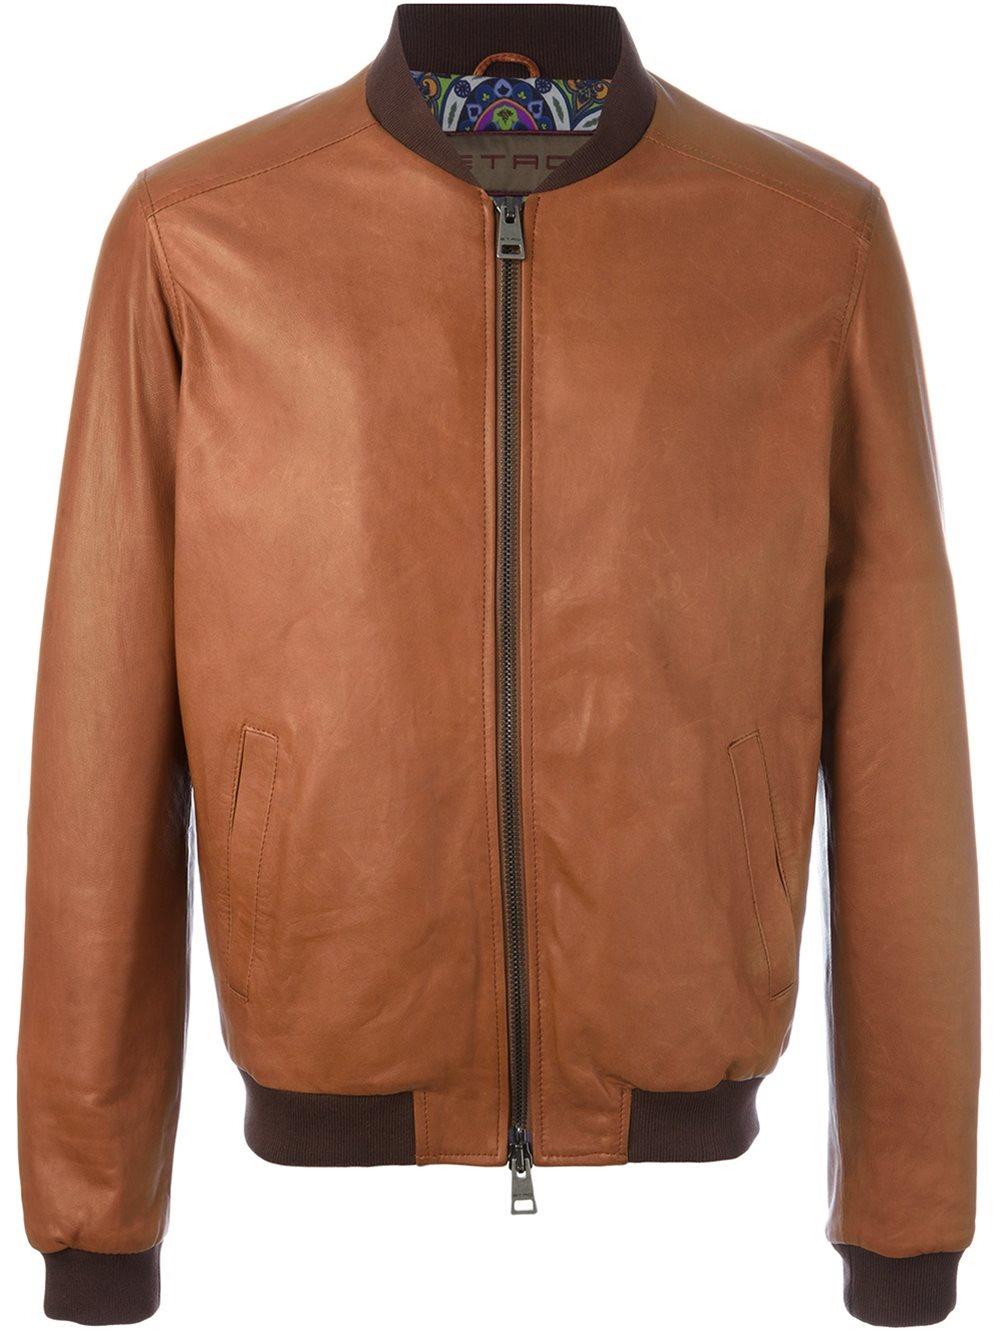 Etro zipped leather jacket in brown for men lyst for Rebajas sofas de piel